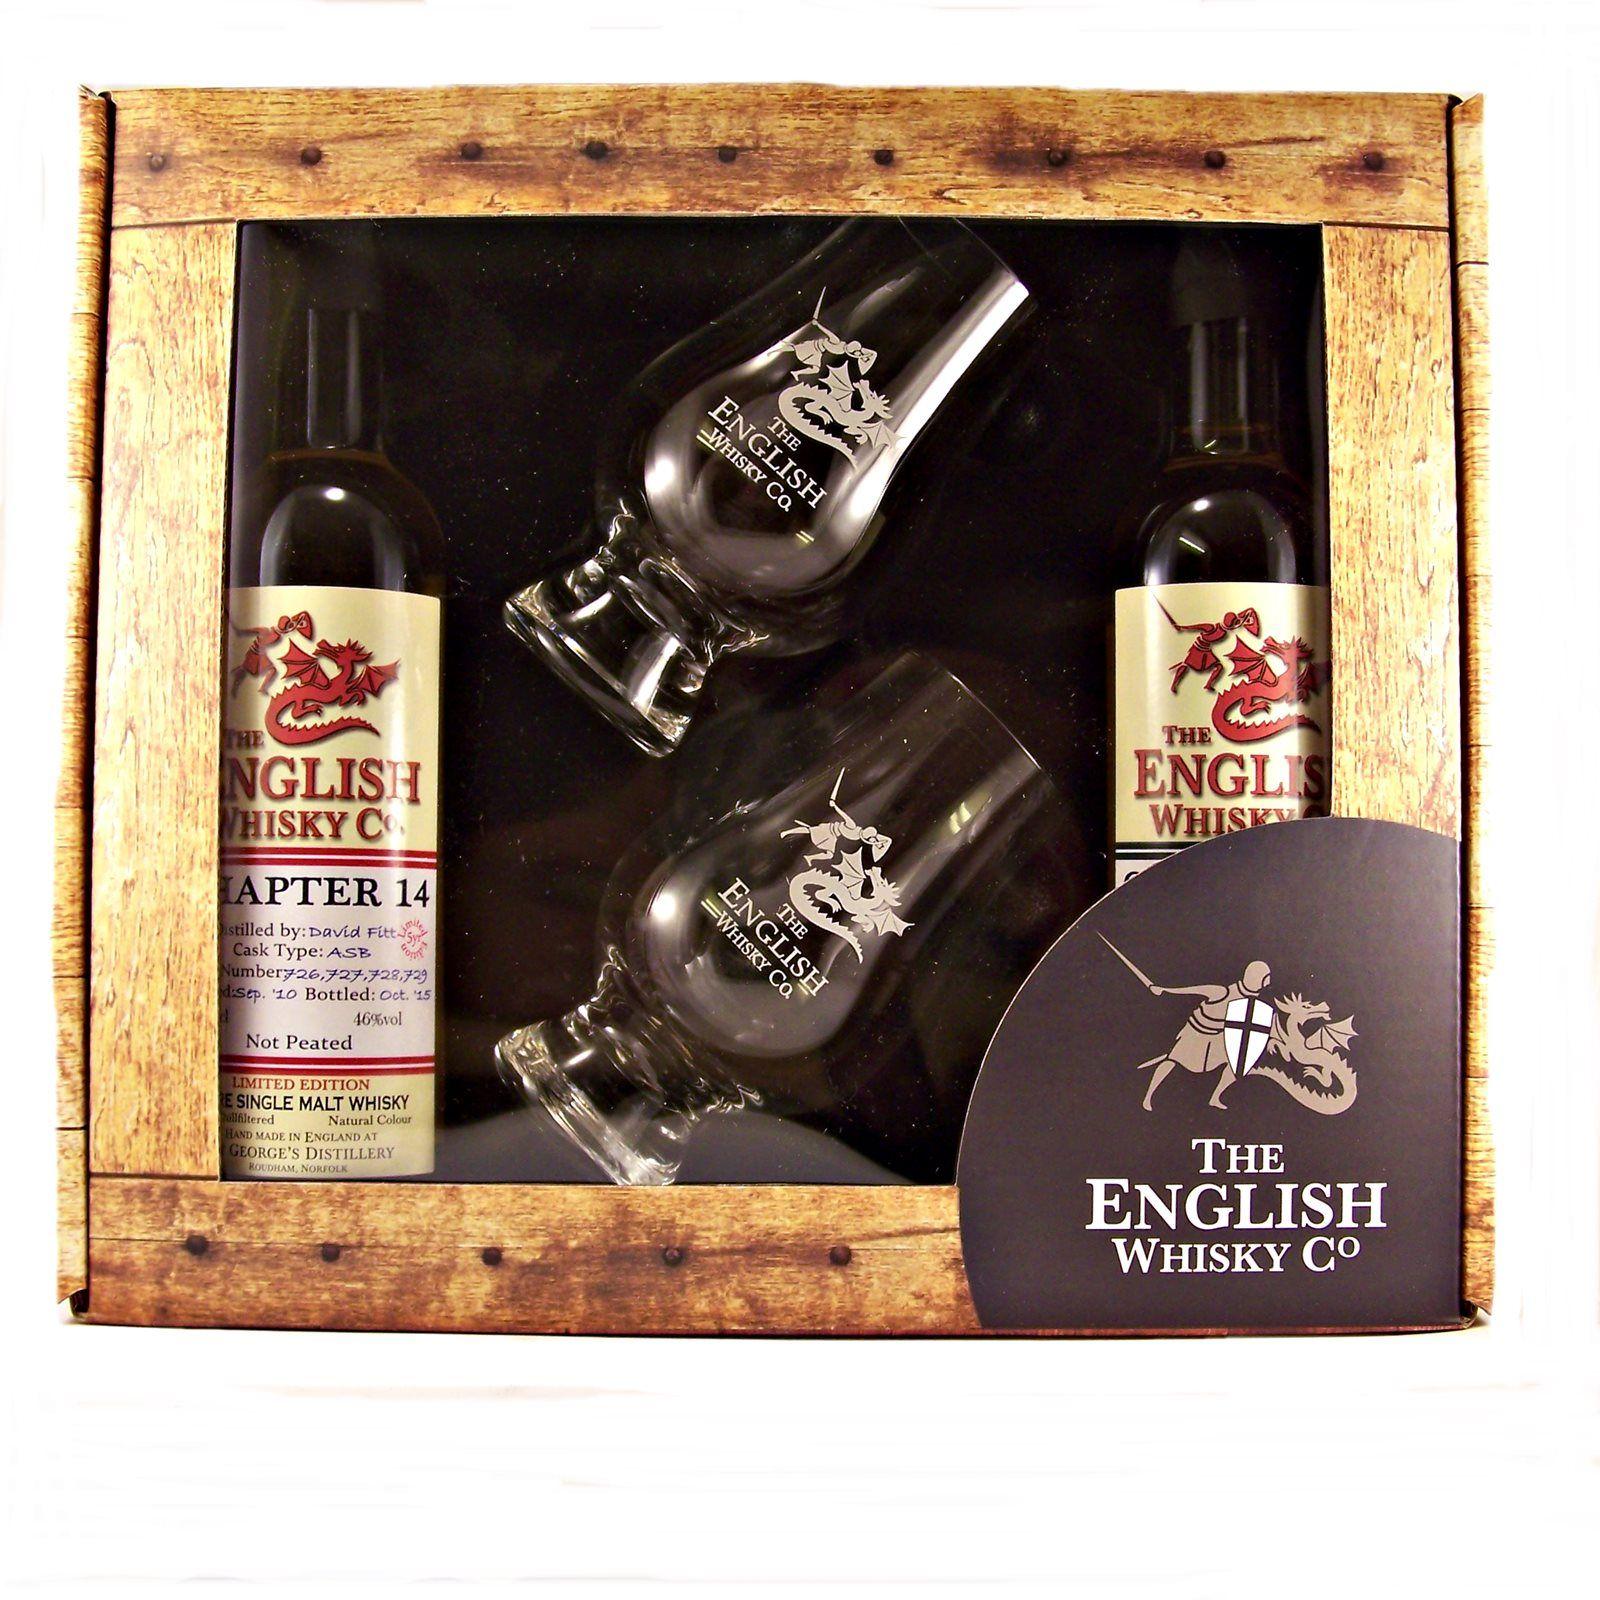 English whisky gift set whisky gift set whisky gifting